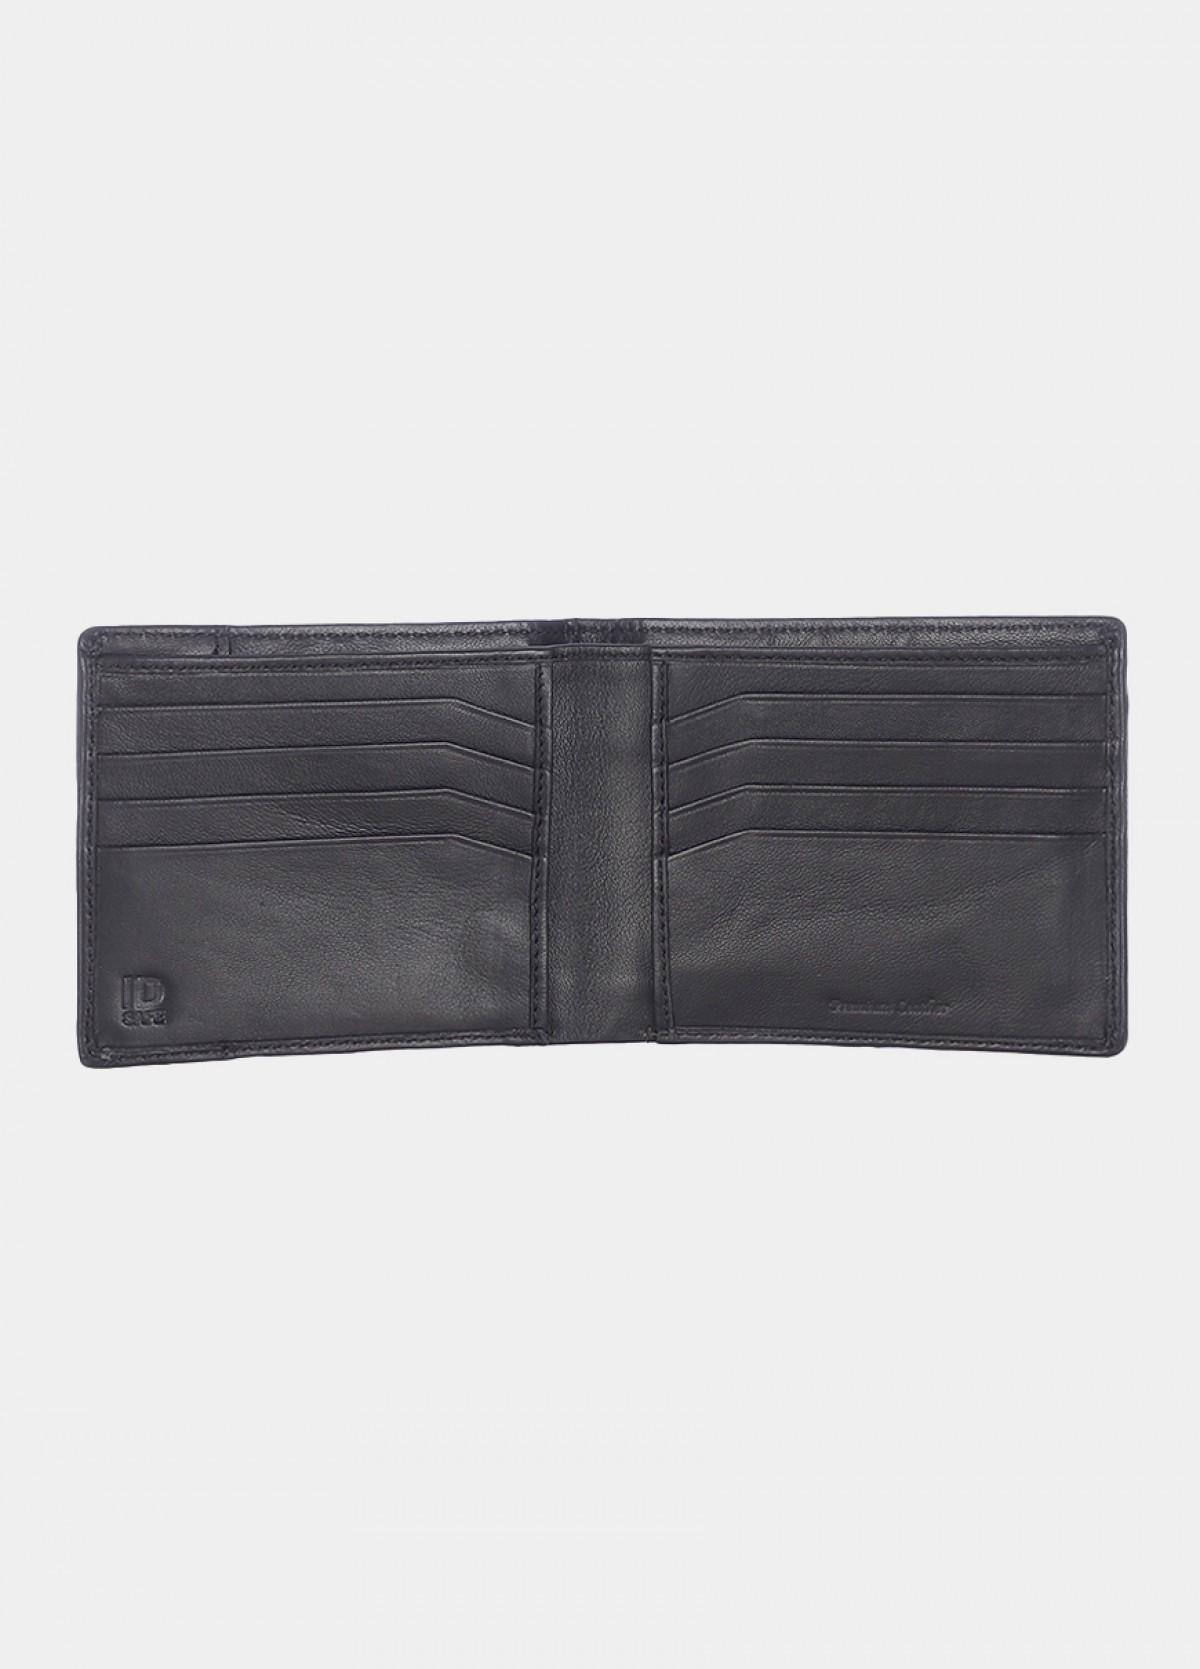 Him & The City Men's Black Bi-Fold Wallet